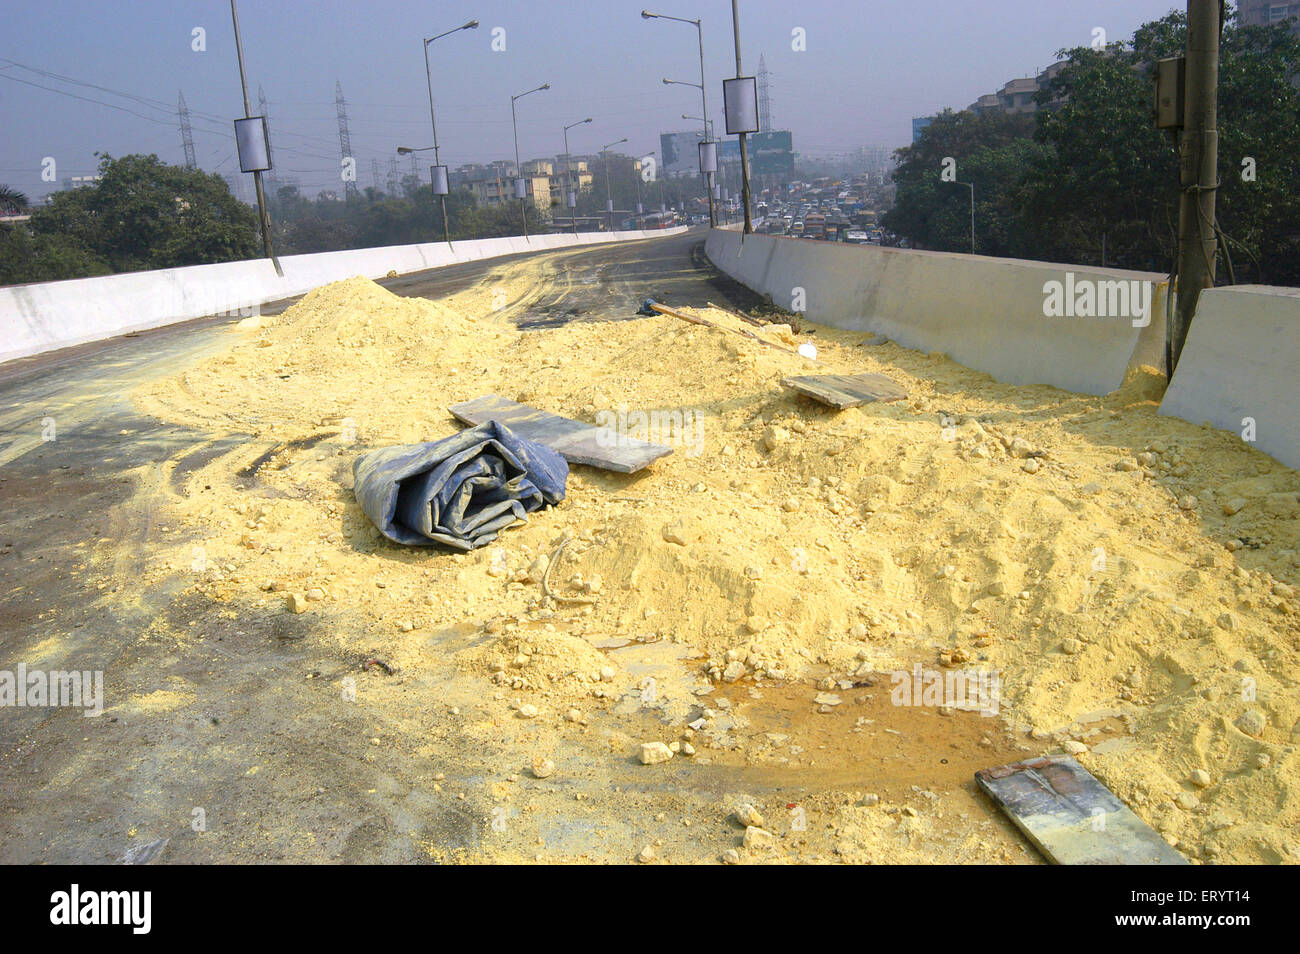 Chemical powder scattered on Sion flyover in Bombay Mumbai ; Maharashtra ; India - Stock Image